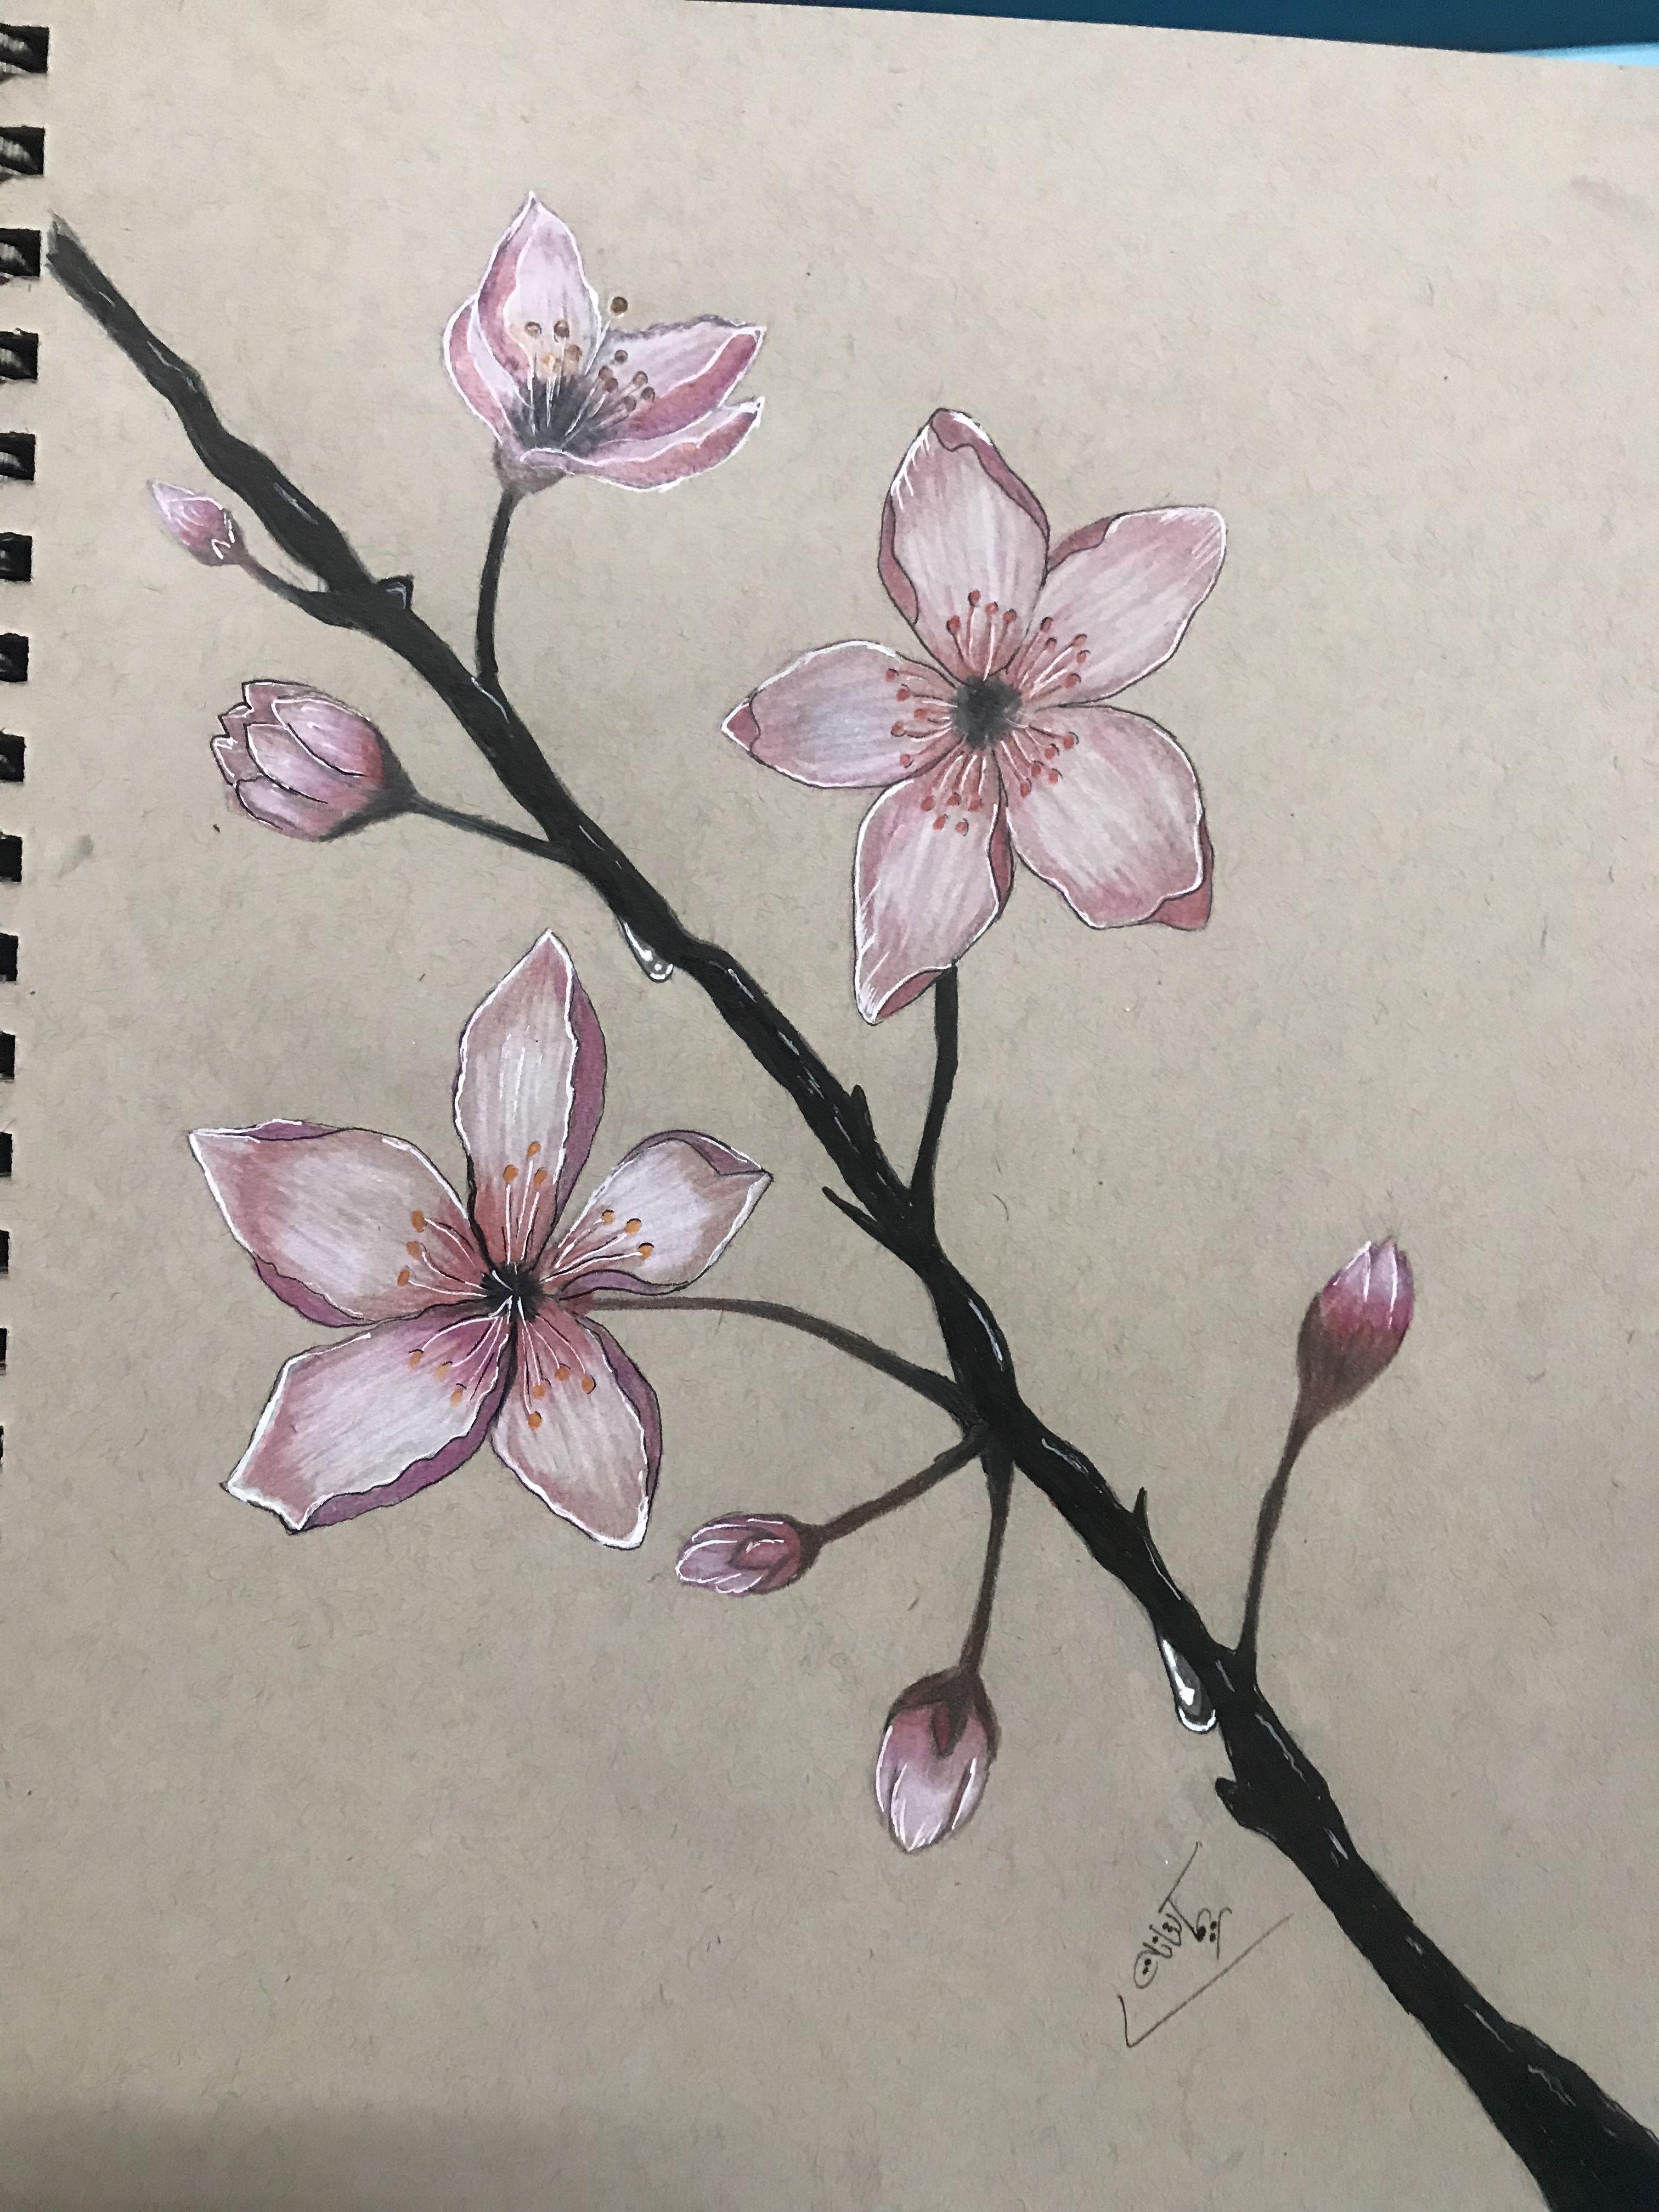 Haw To Draw Flowers With Vase تعليم الرسم رسم مزهرية ورد بخطوات جد Enamel Pins Cute Unique